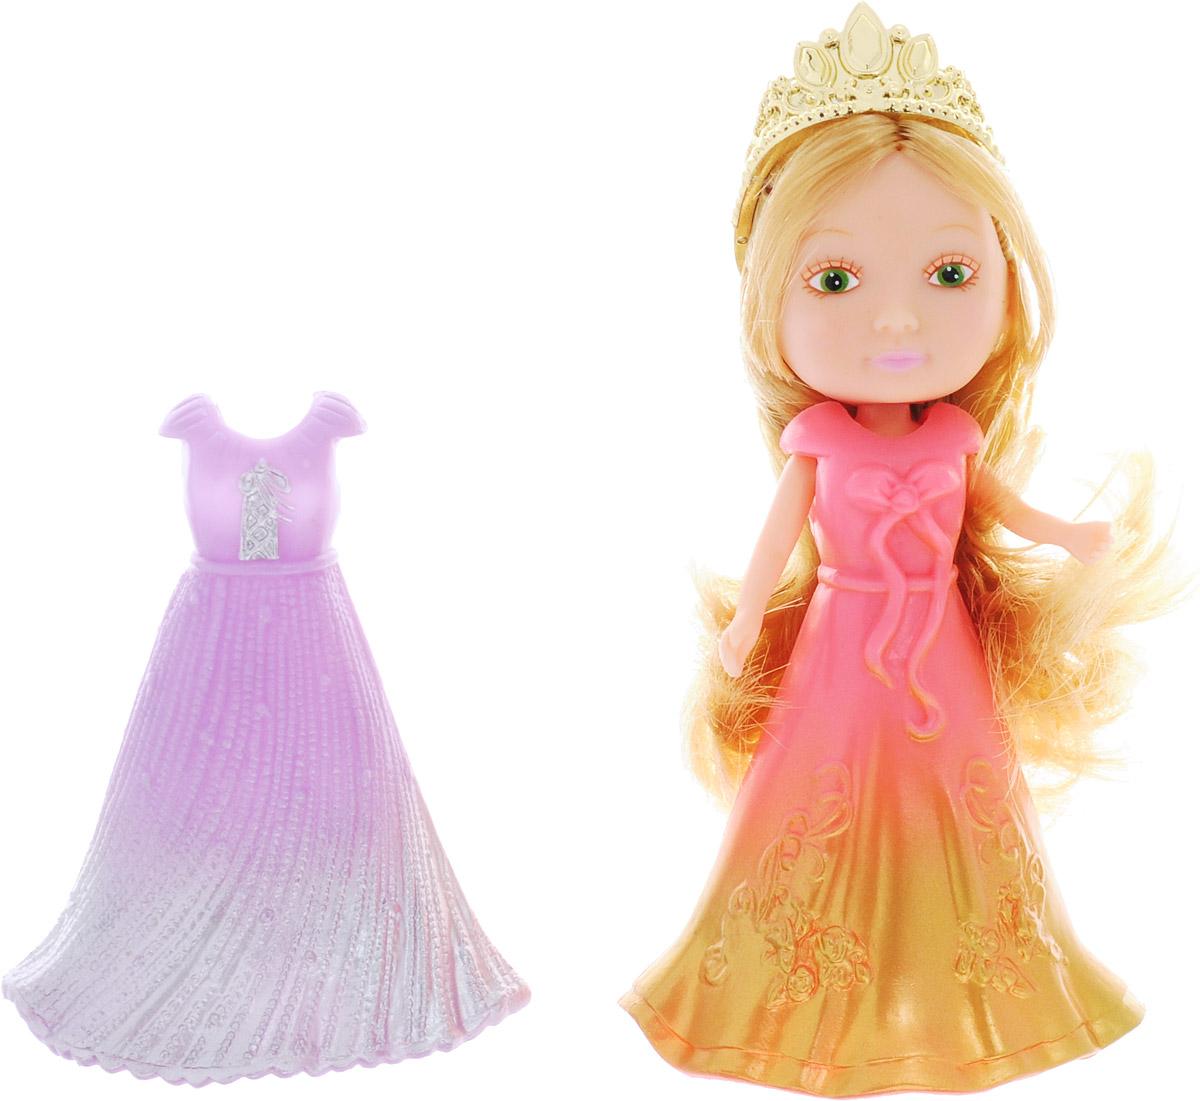 Veld-Co Мини-кукла Принцесса цвет золотистый сиреневый розовый veld co мини кукла mona с черепахой